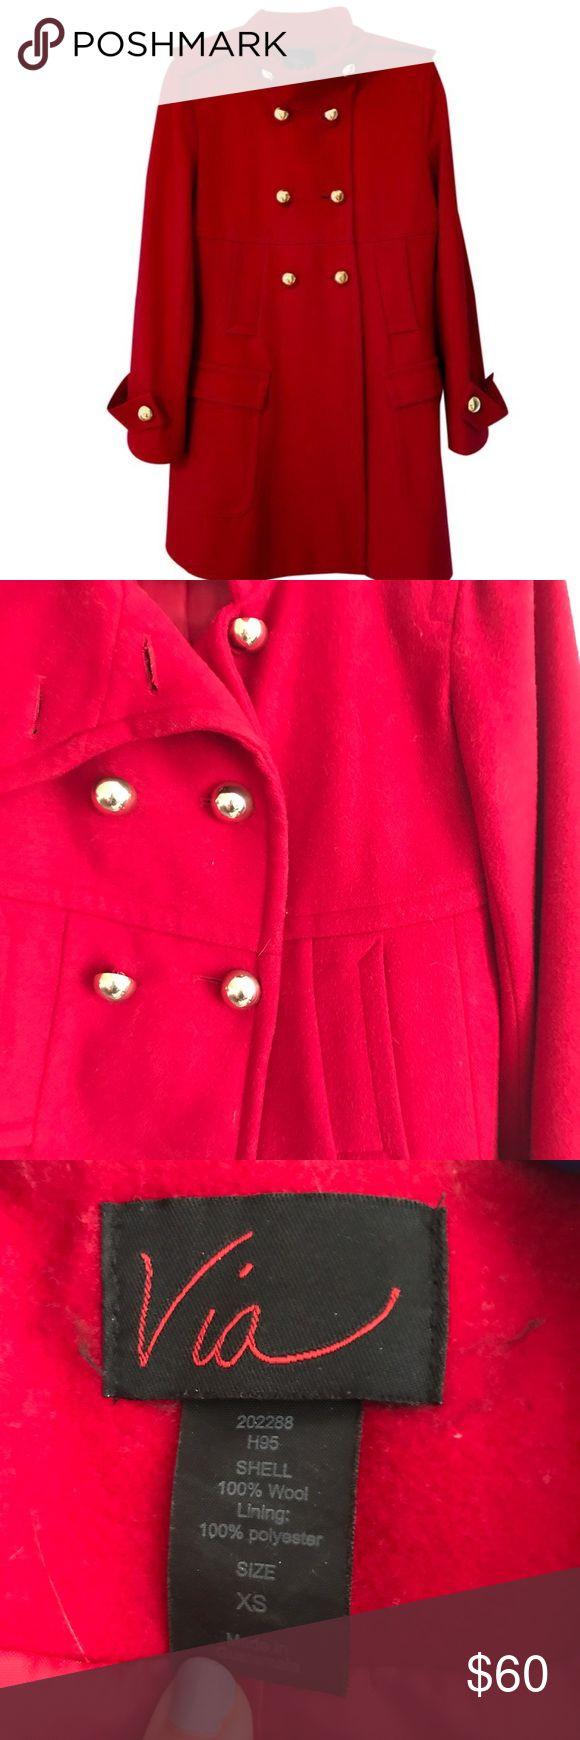 Via red pea coat with gold buttons Gorgeous pea coat, runs bigger than an xs. Gold buttons, medium length via  Jackets & Coats Pea Coats